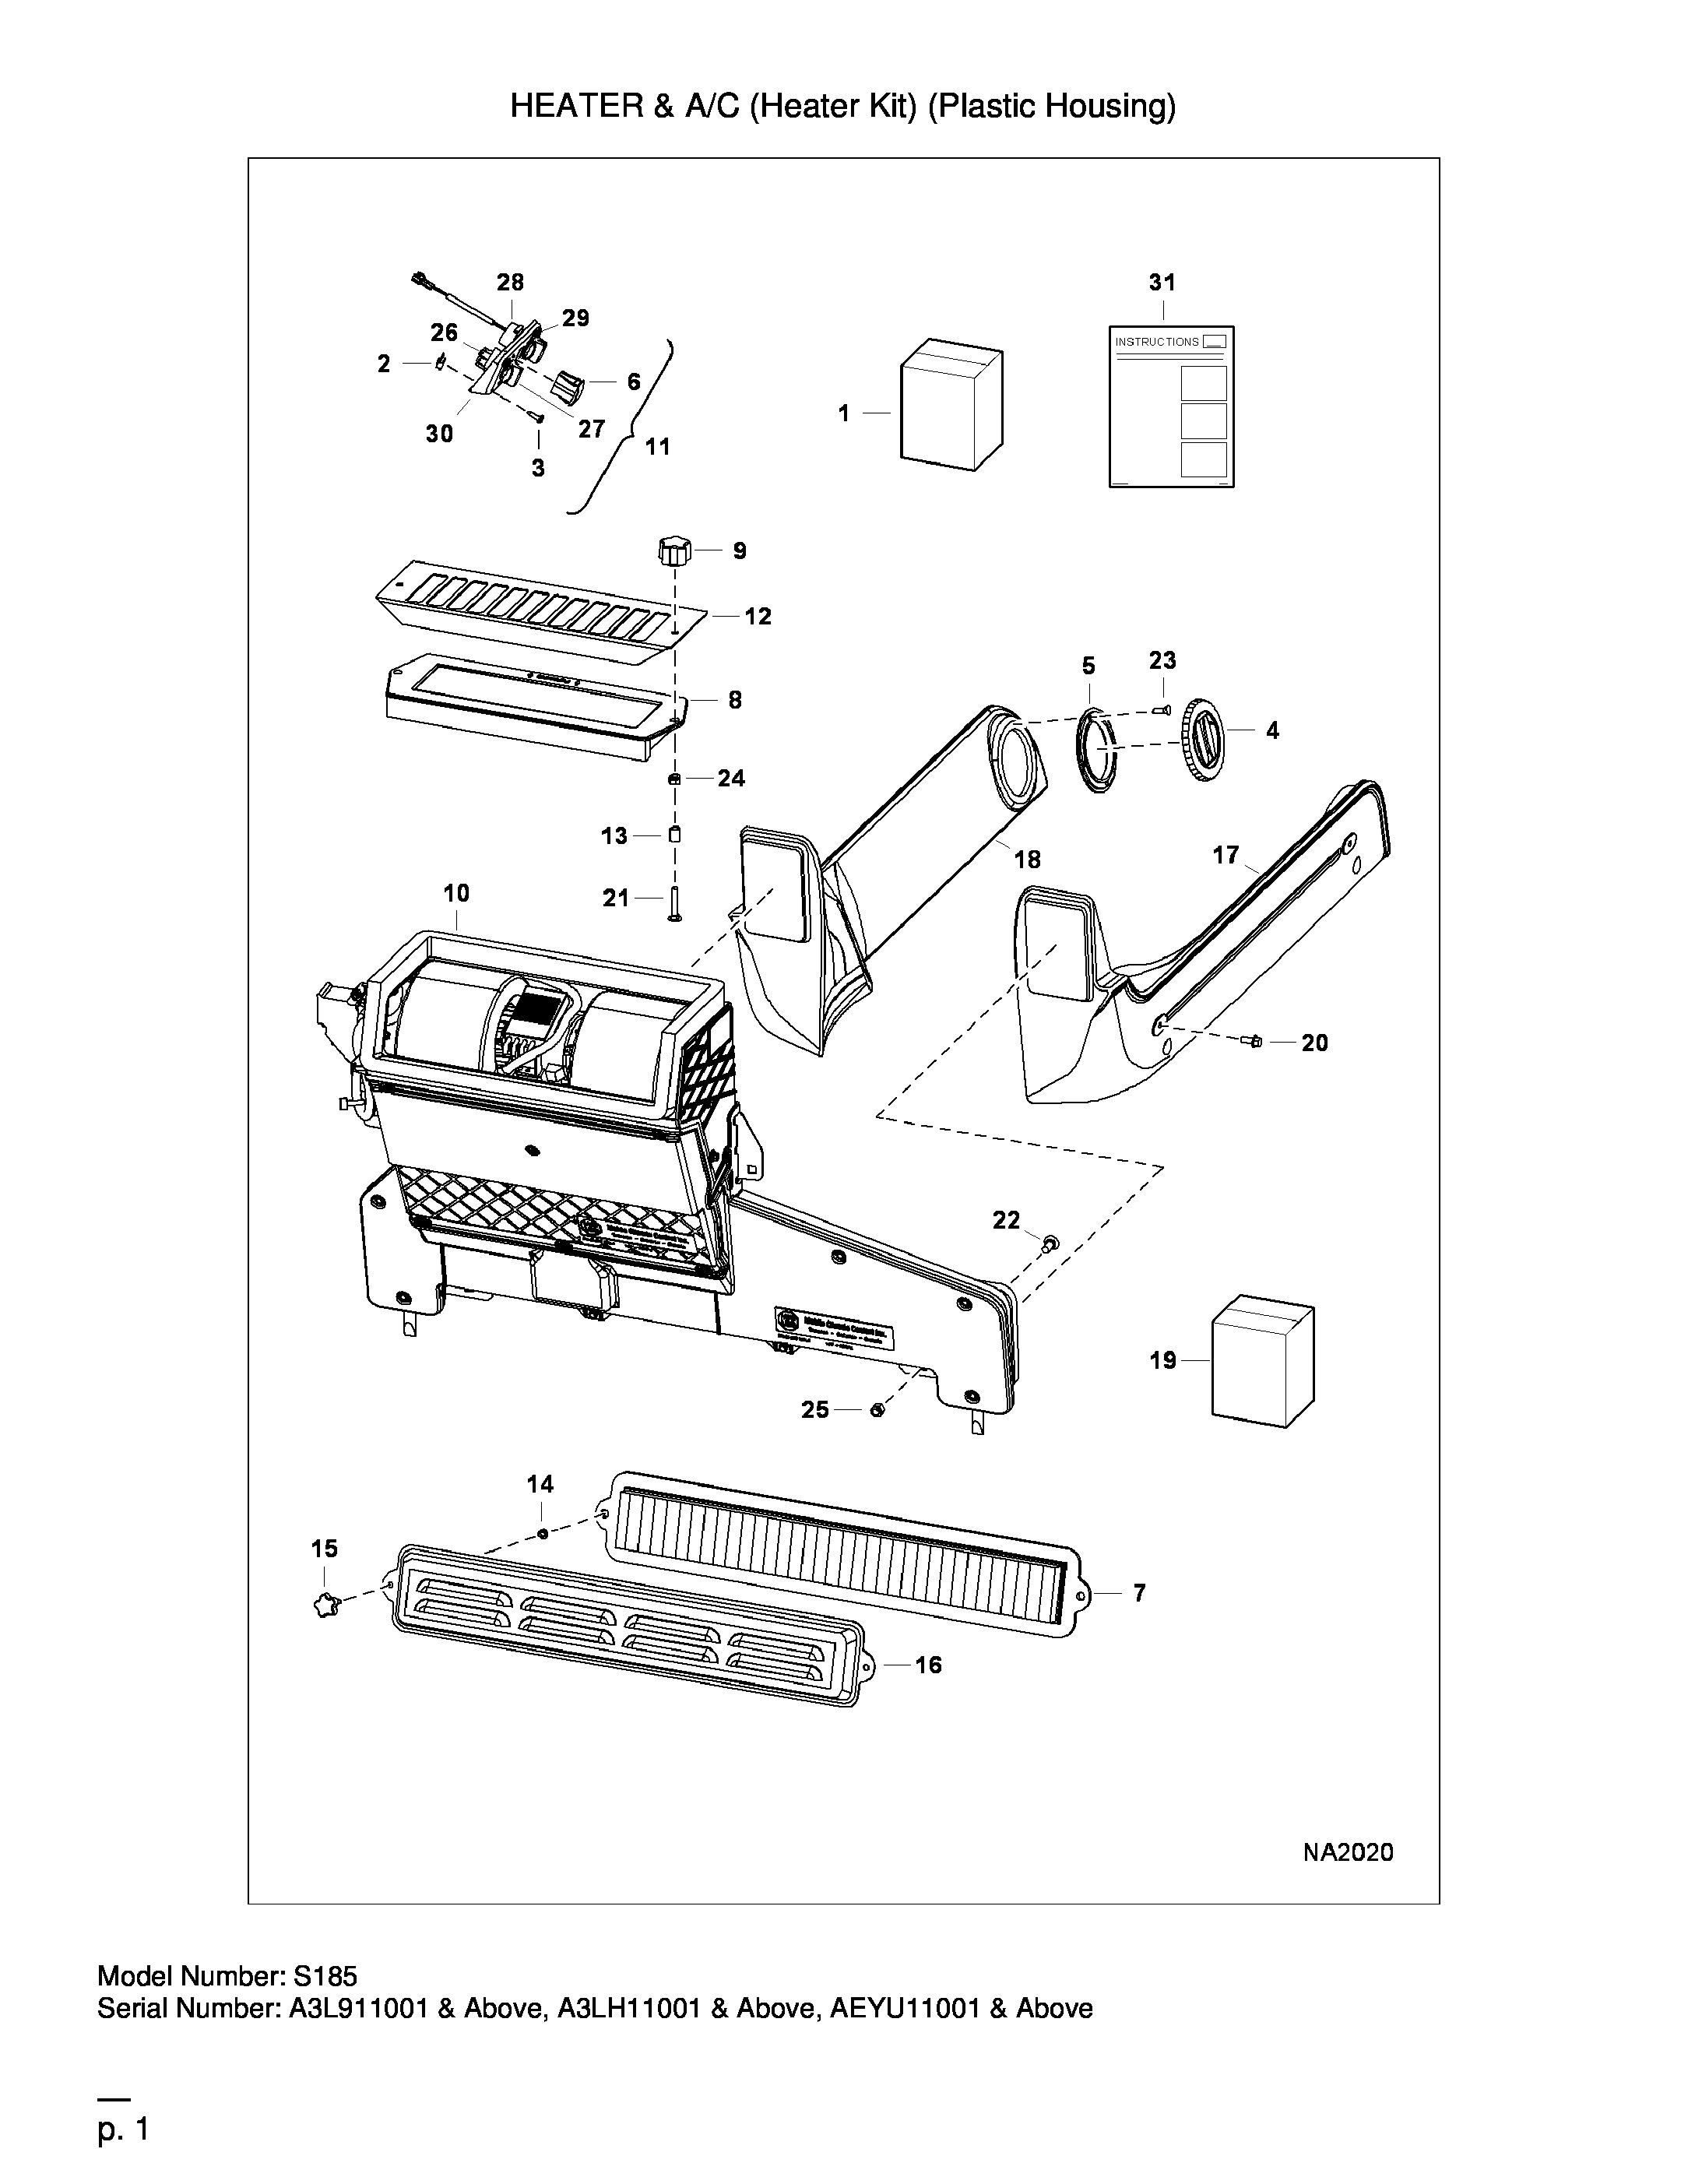 Chauffage Et Air Conditionne Heater Kit Plastic Housing